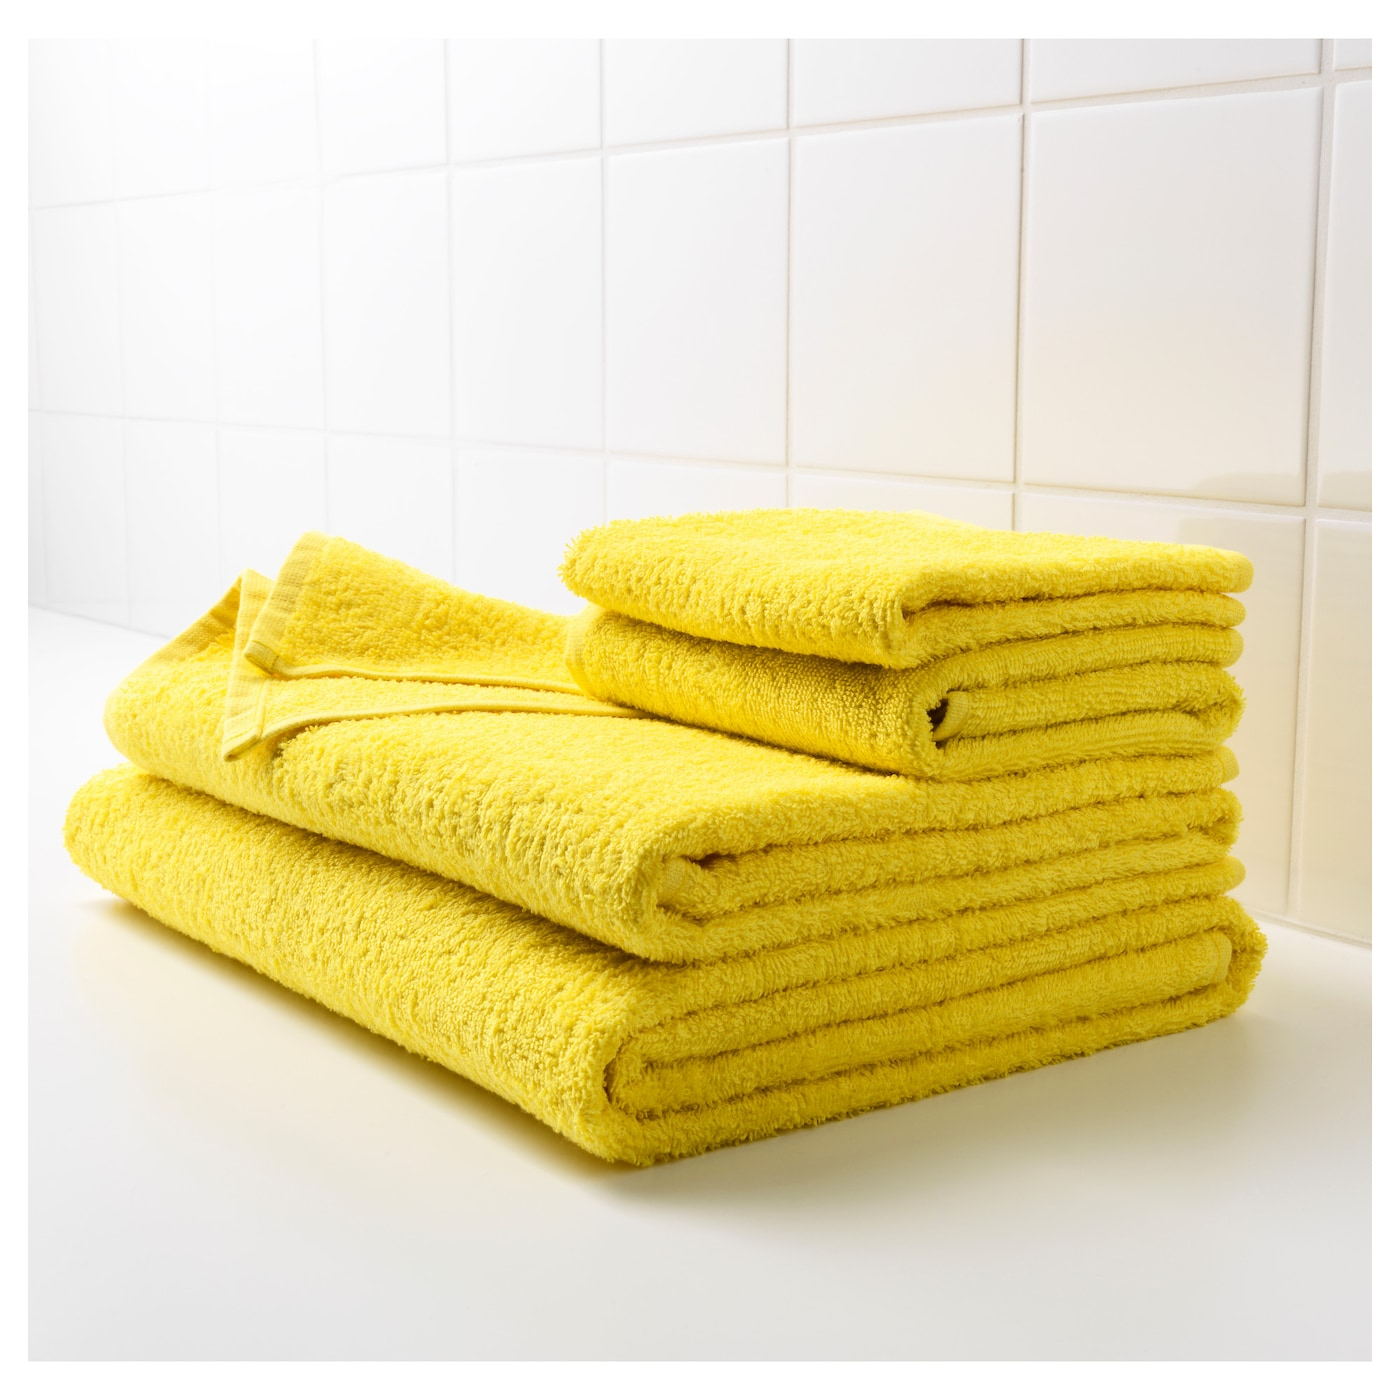 h ren bath towel bright yellow 70x140 cm ikea. Black Bedroom Furniture Sets. Home Design Ideas